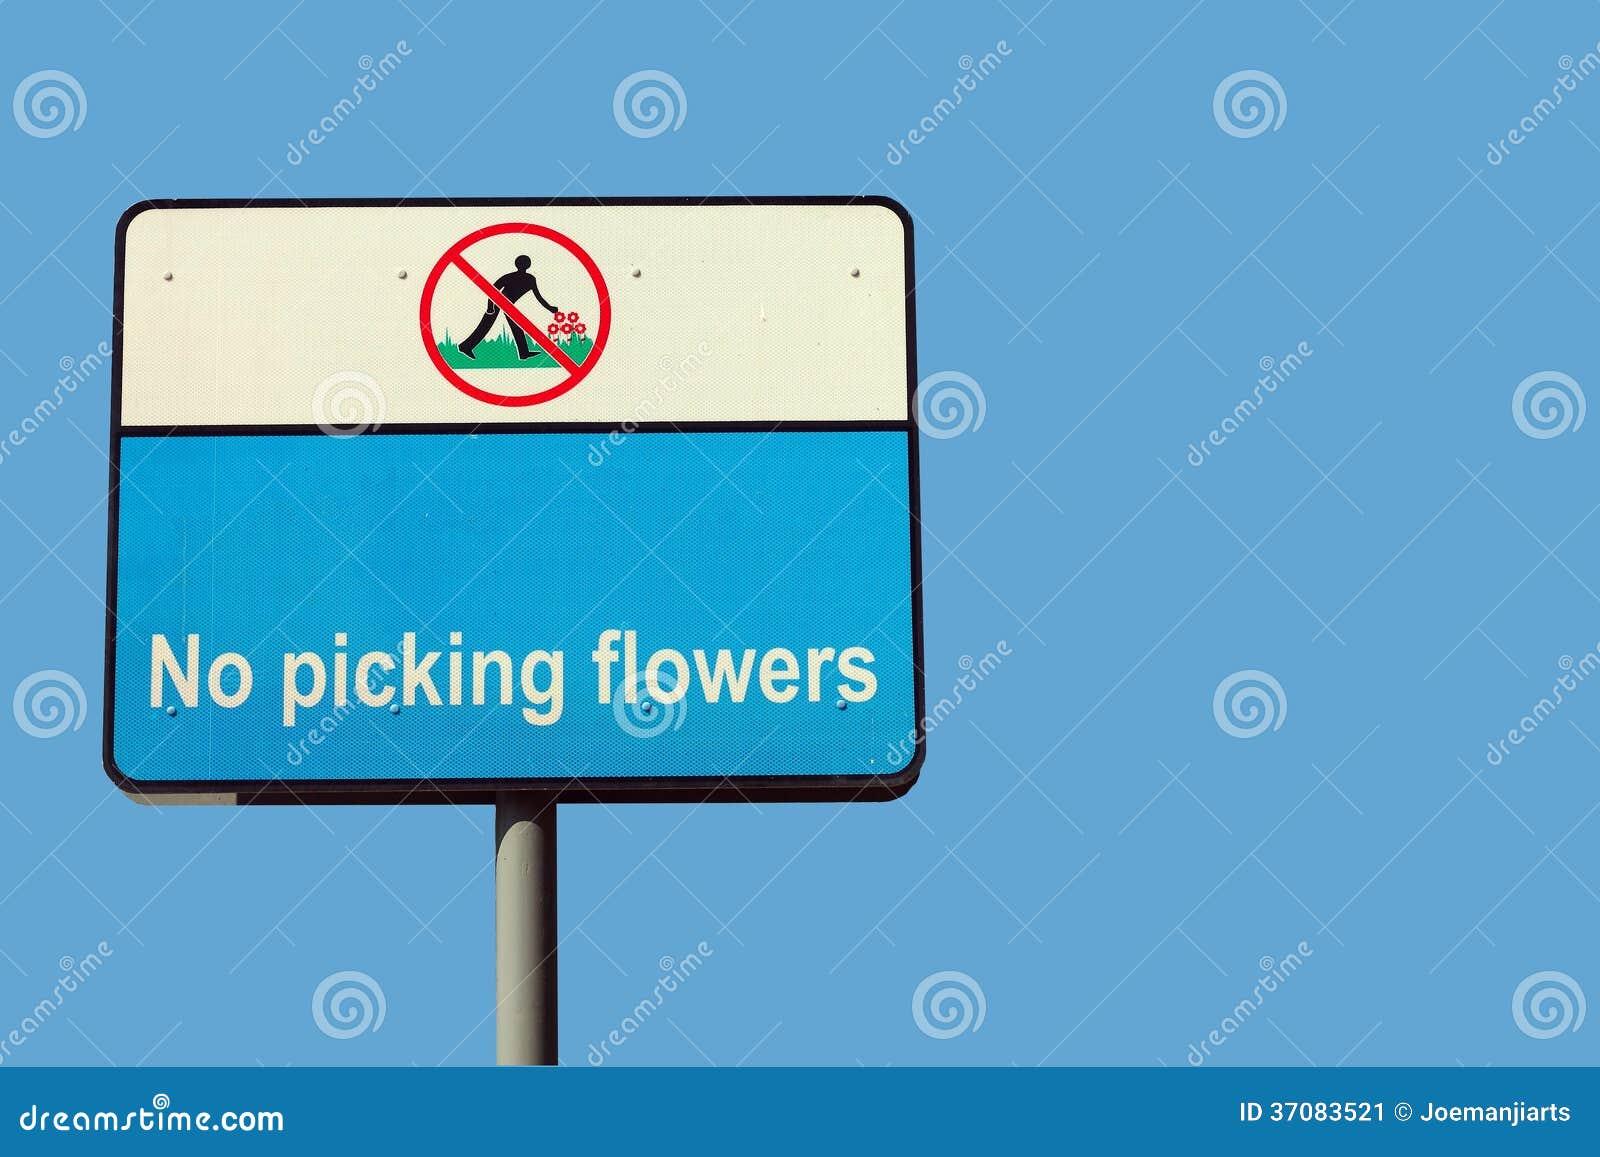 no picking flowers stock image image 37083521